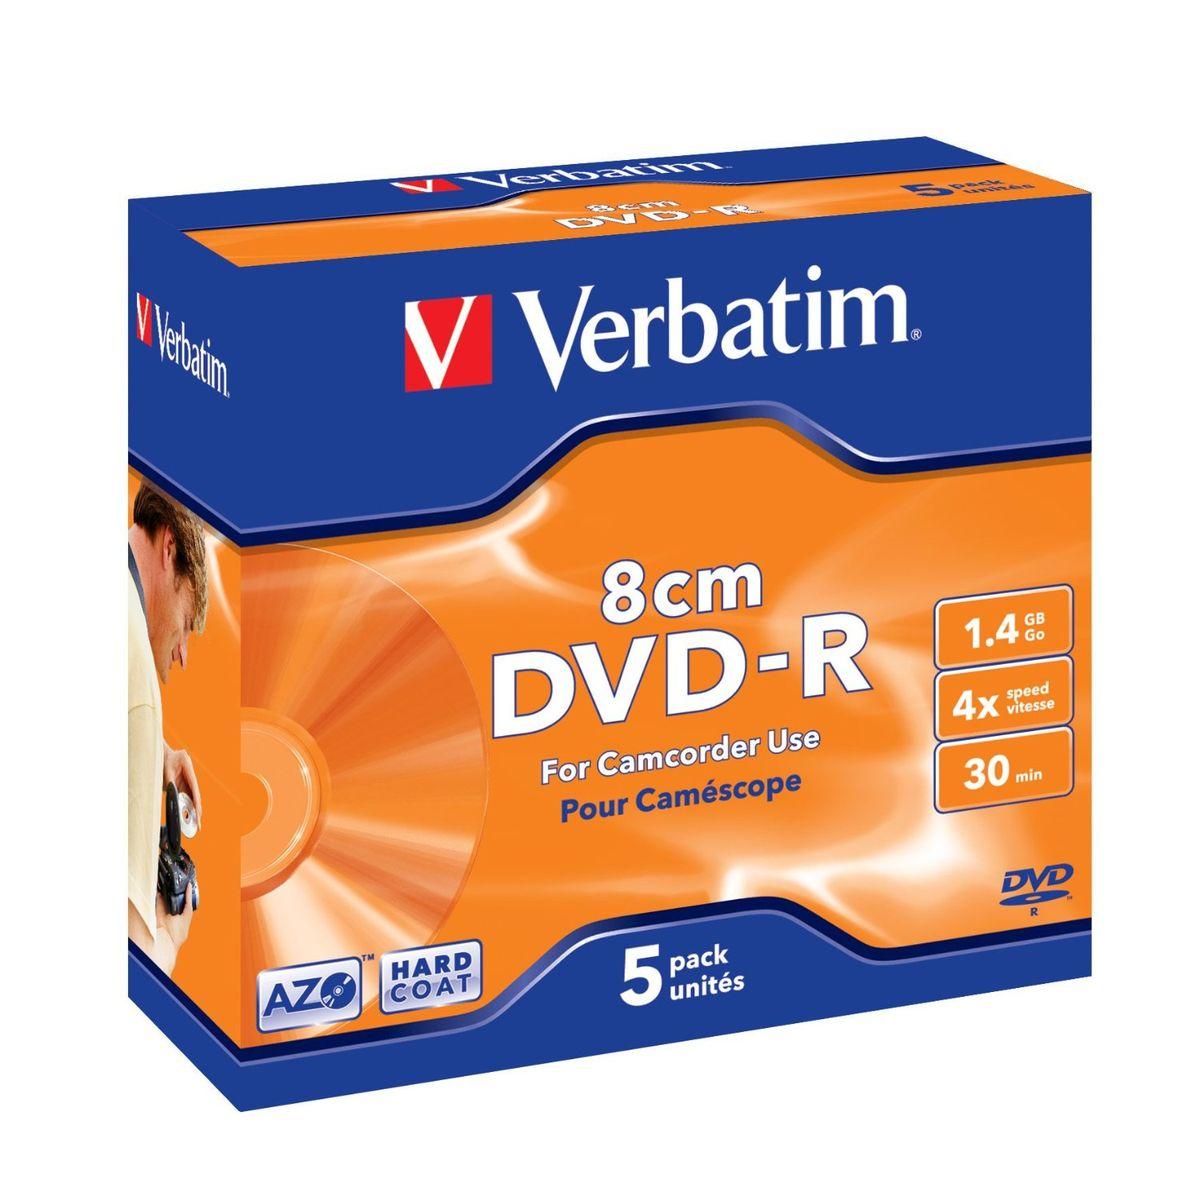 Verbatim DVD-R 1.4Gb 4х лазерный диск, 5 шт